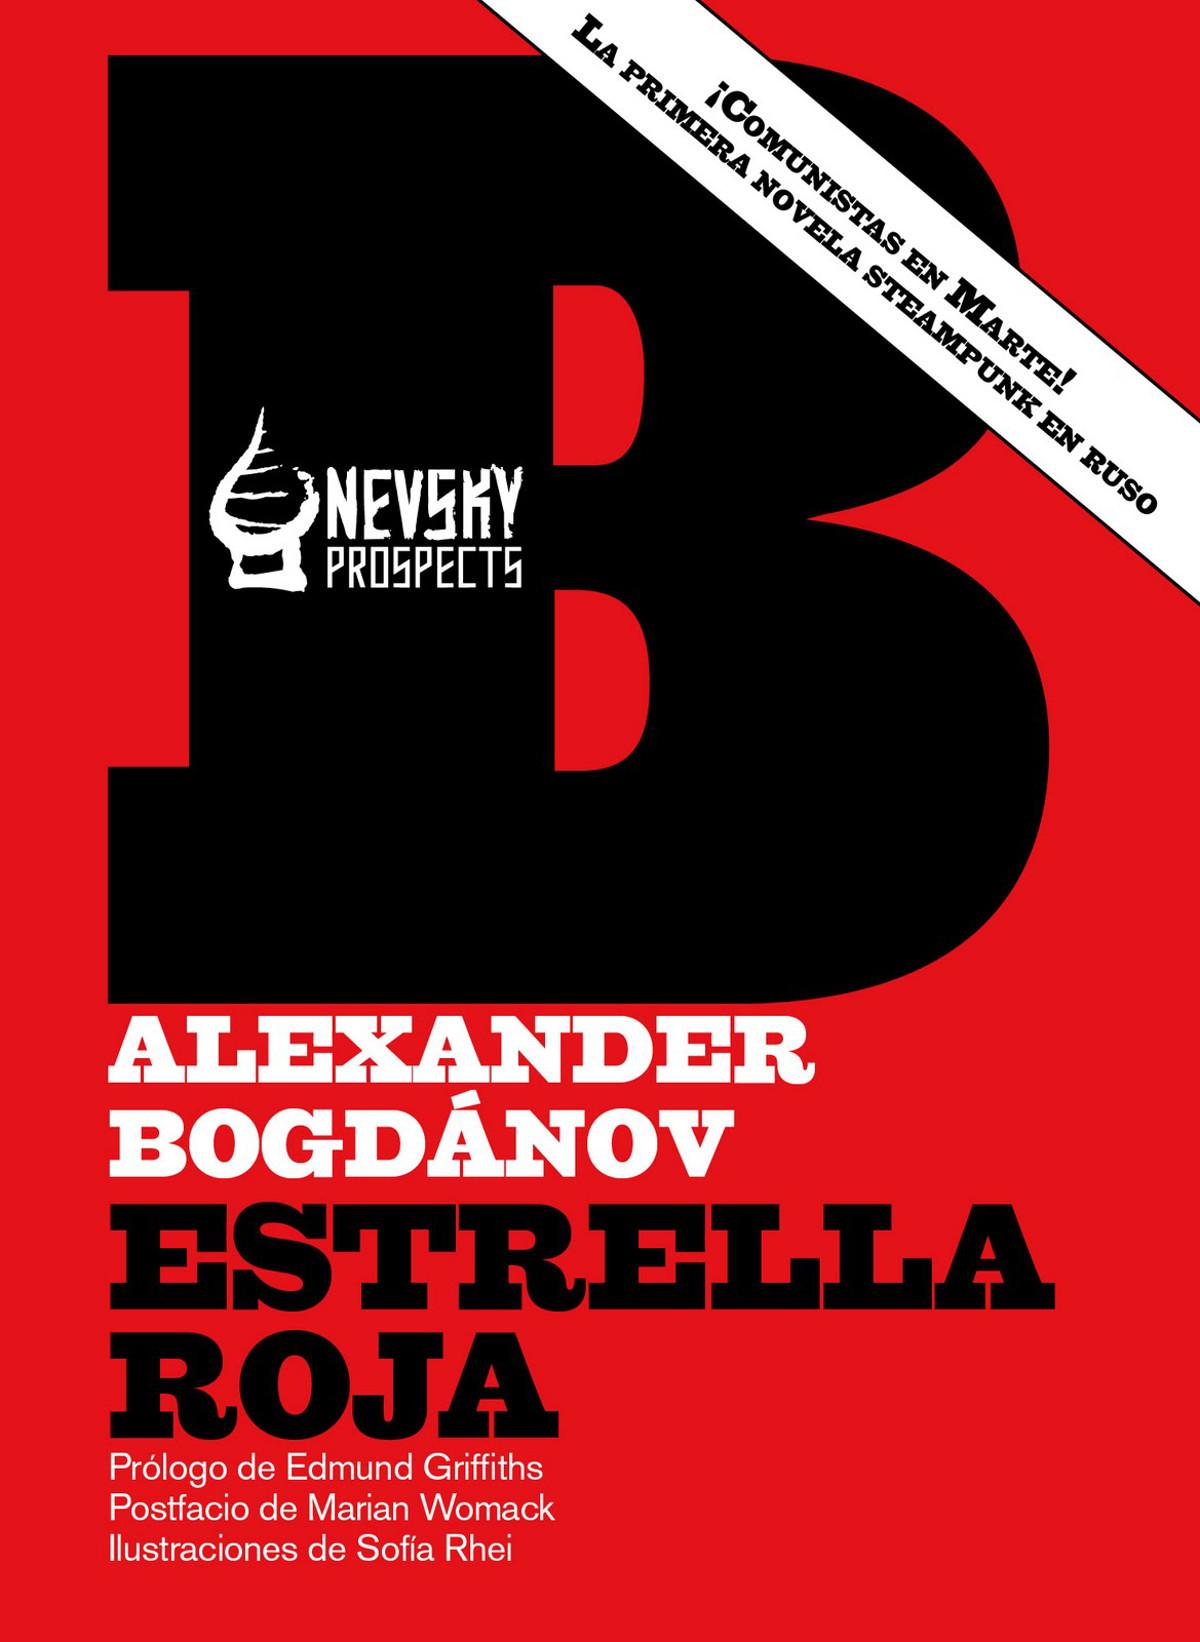 "Resultat d'imatges per a ""alexander bogdanov"""""